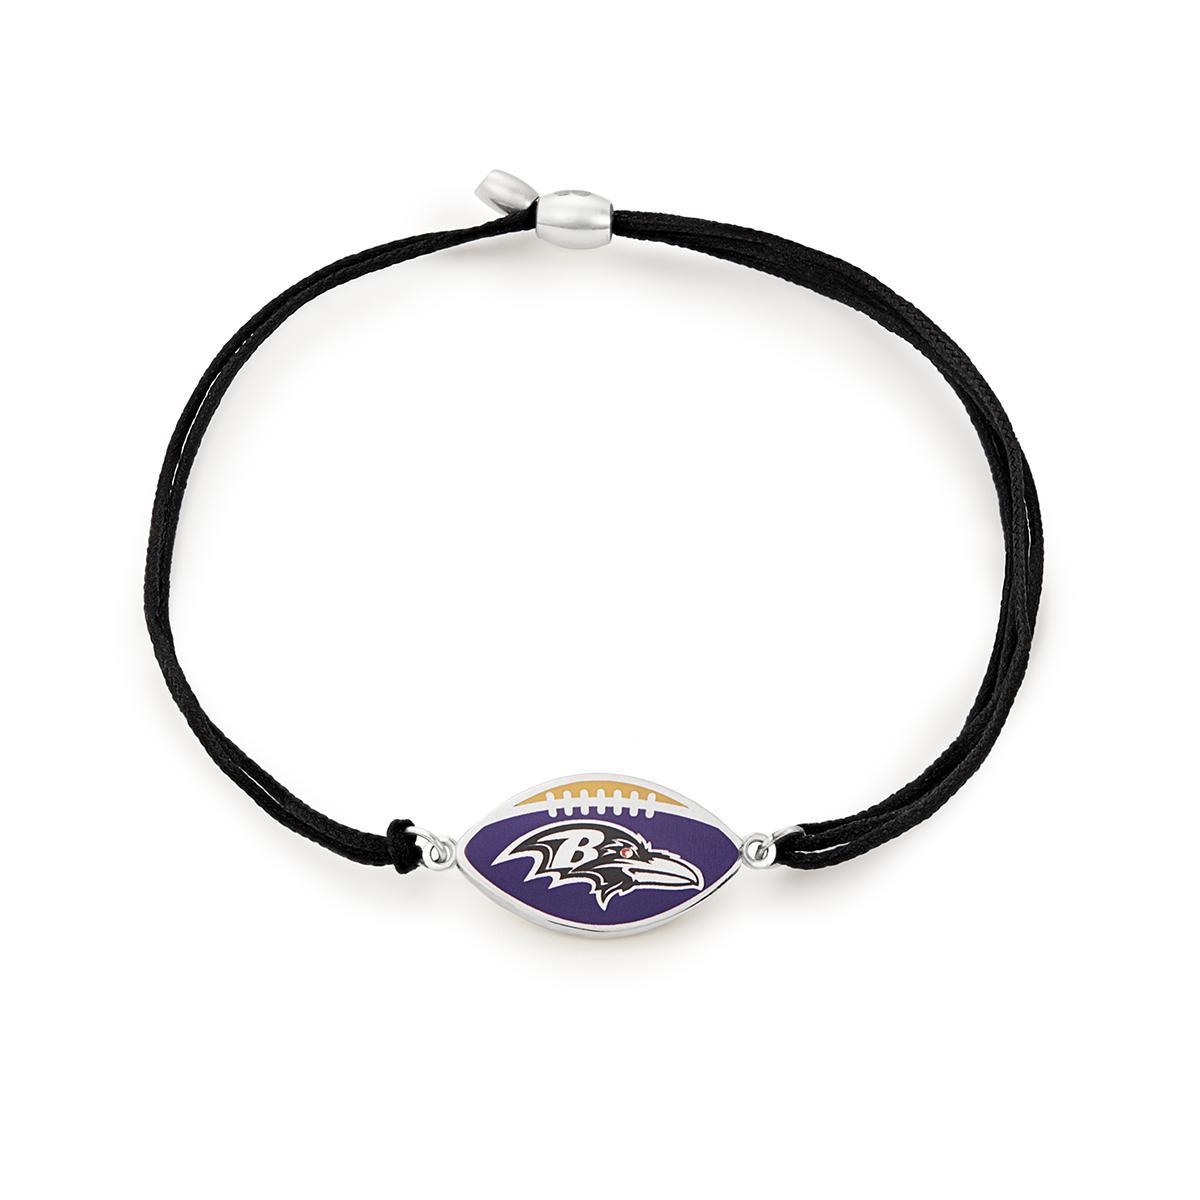 86d1f5d8435c7 Lyst - ALEX AND ANI Oakland Raiders Pull Cord Bracelet in Metallic ...